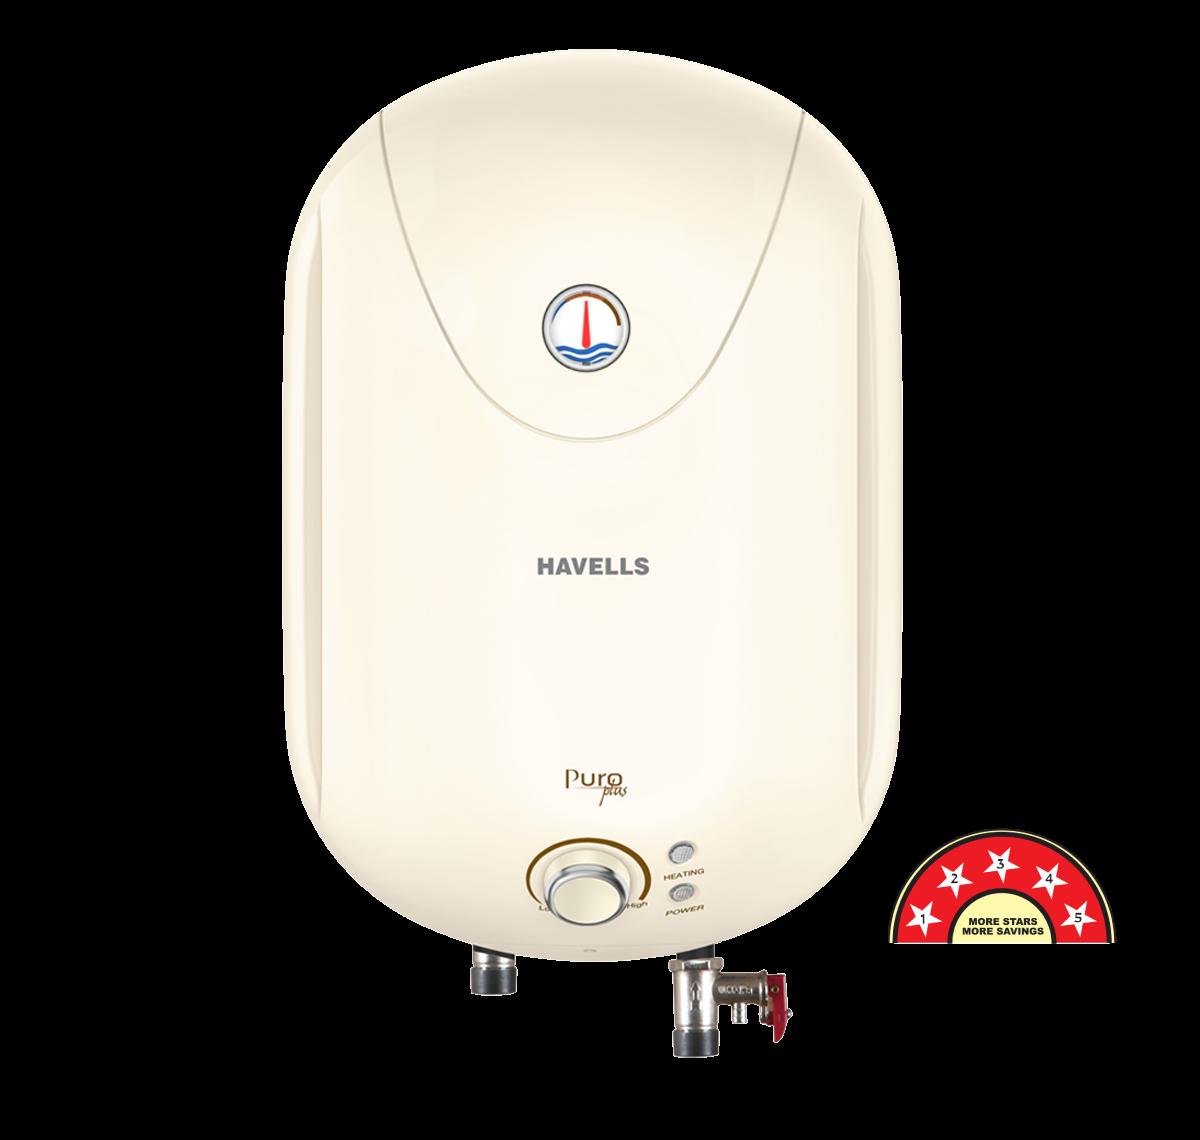 fdecdbeb285f08 Havells puro-plus 25 L ivoryStorage Water Heater Online - Havells India